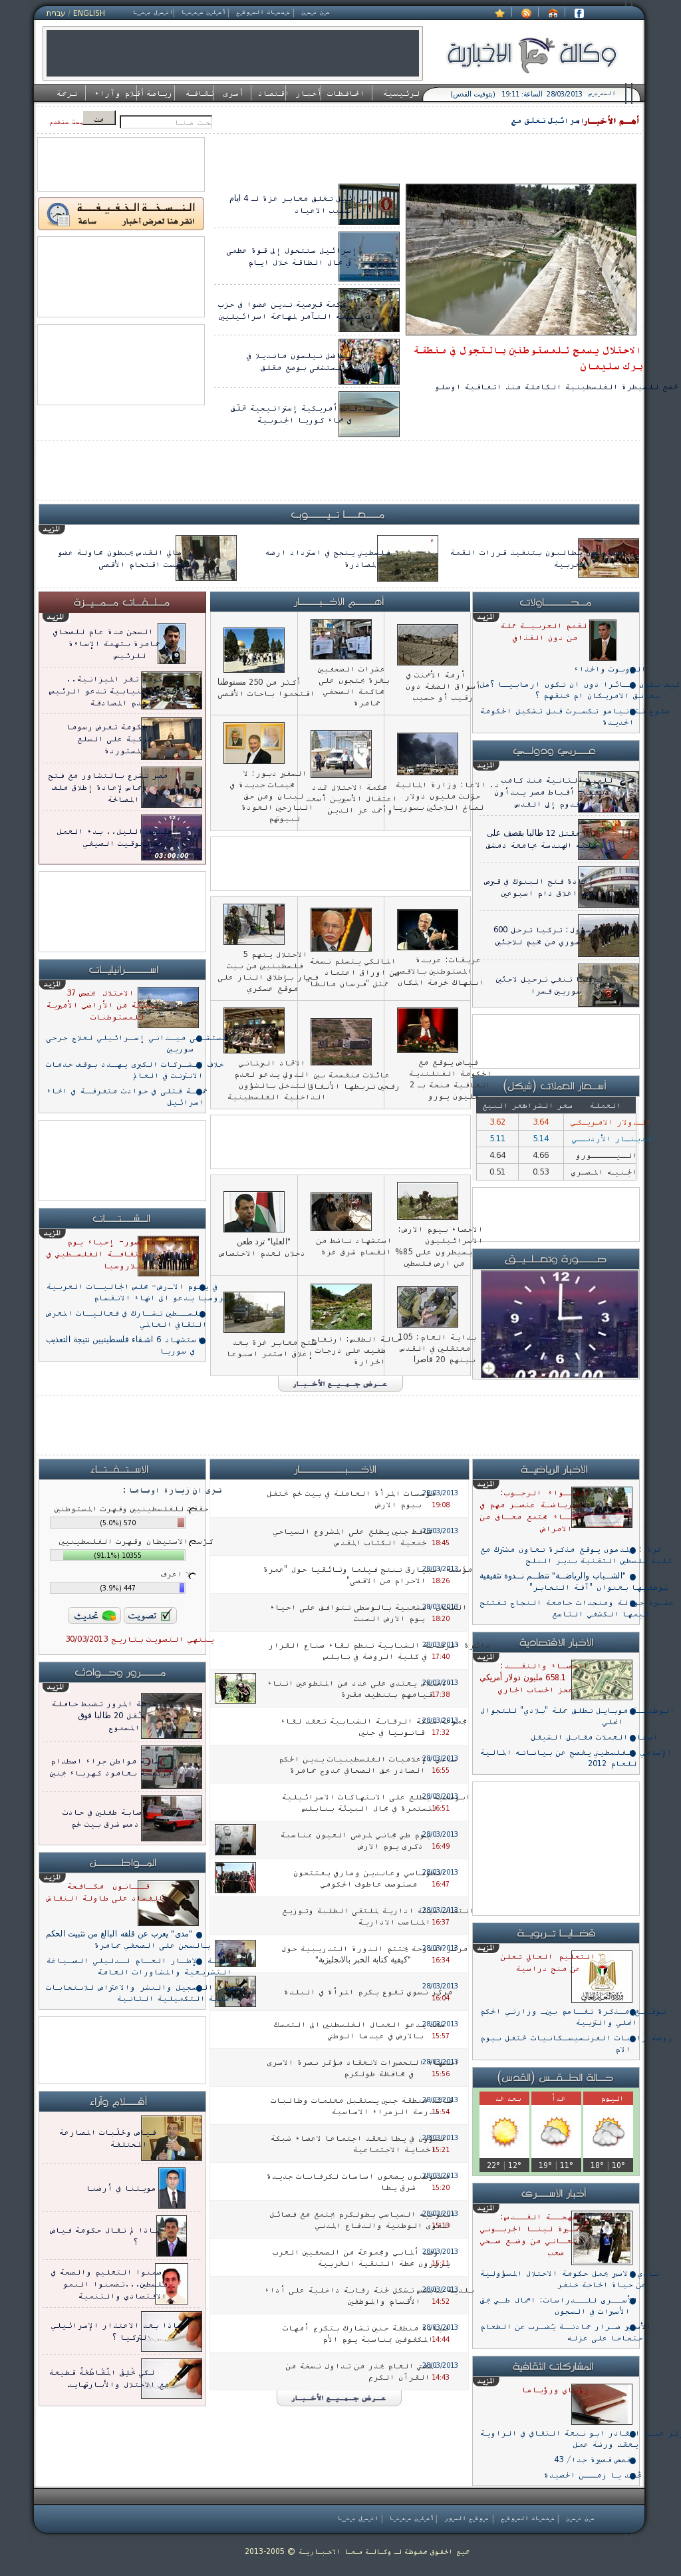 Ma'an News at Thursday March 28, 2013, 5:11 p.m. UTC